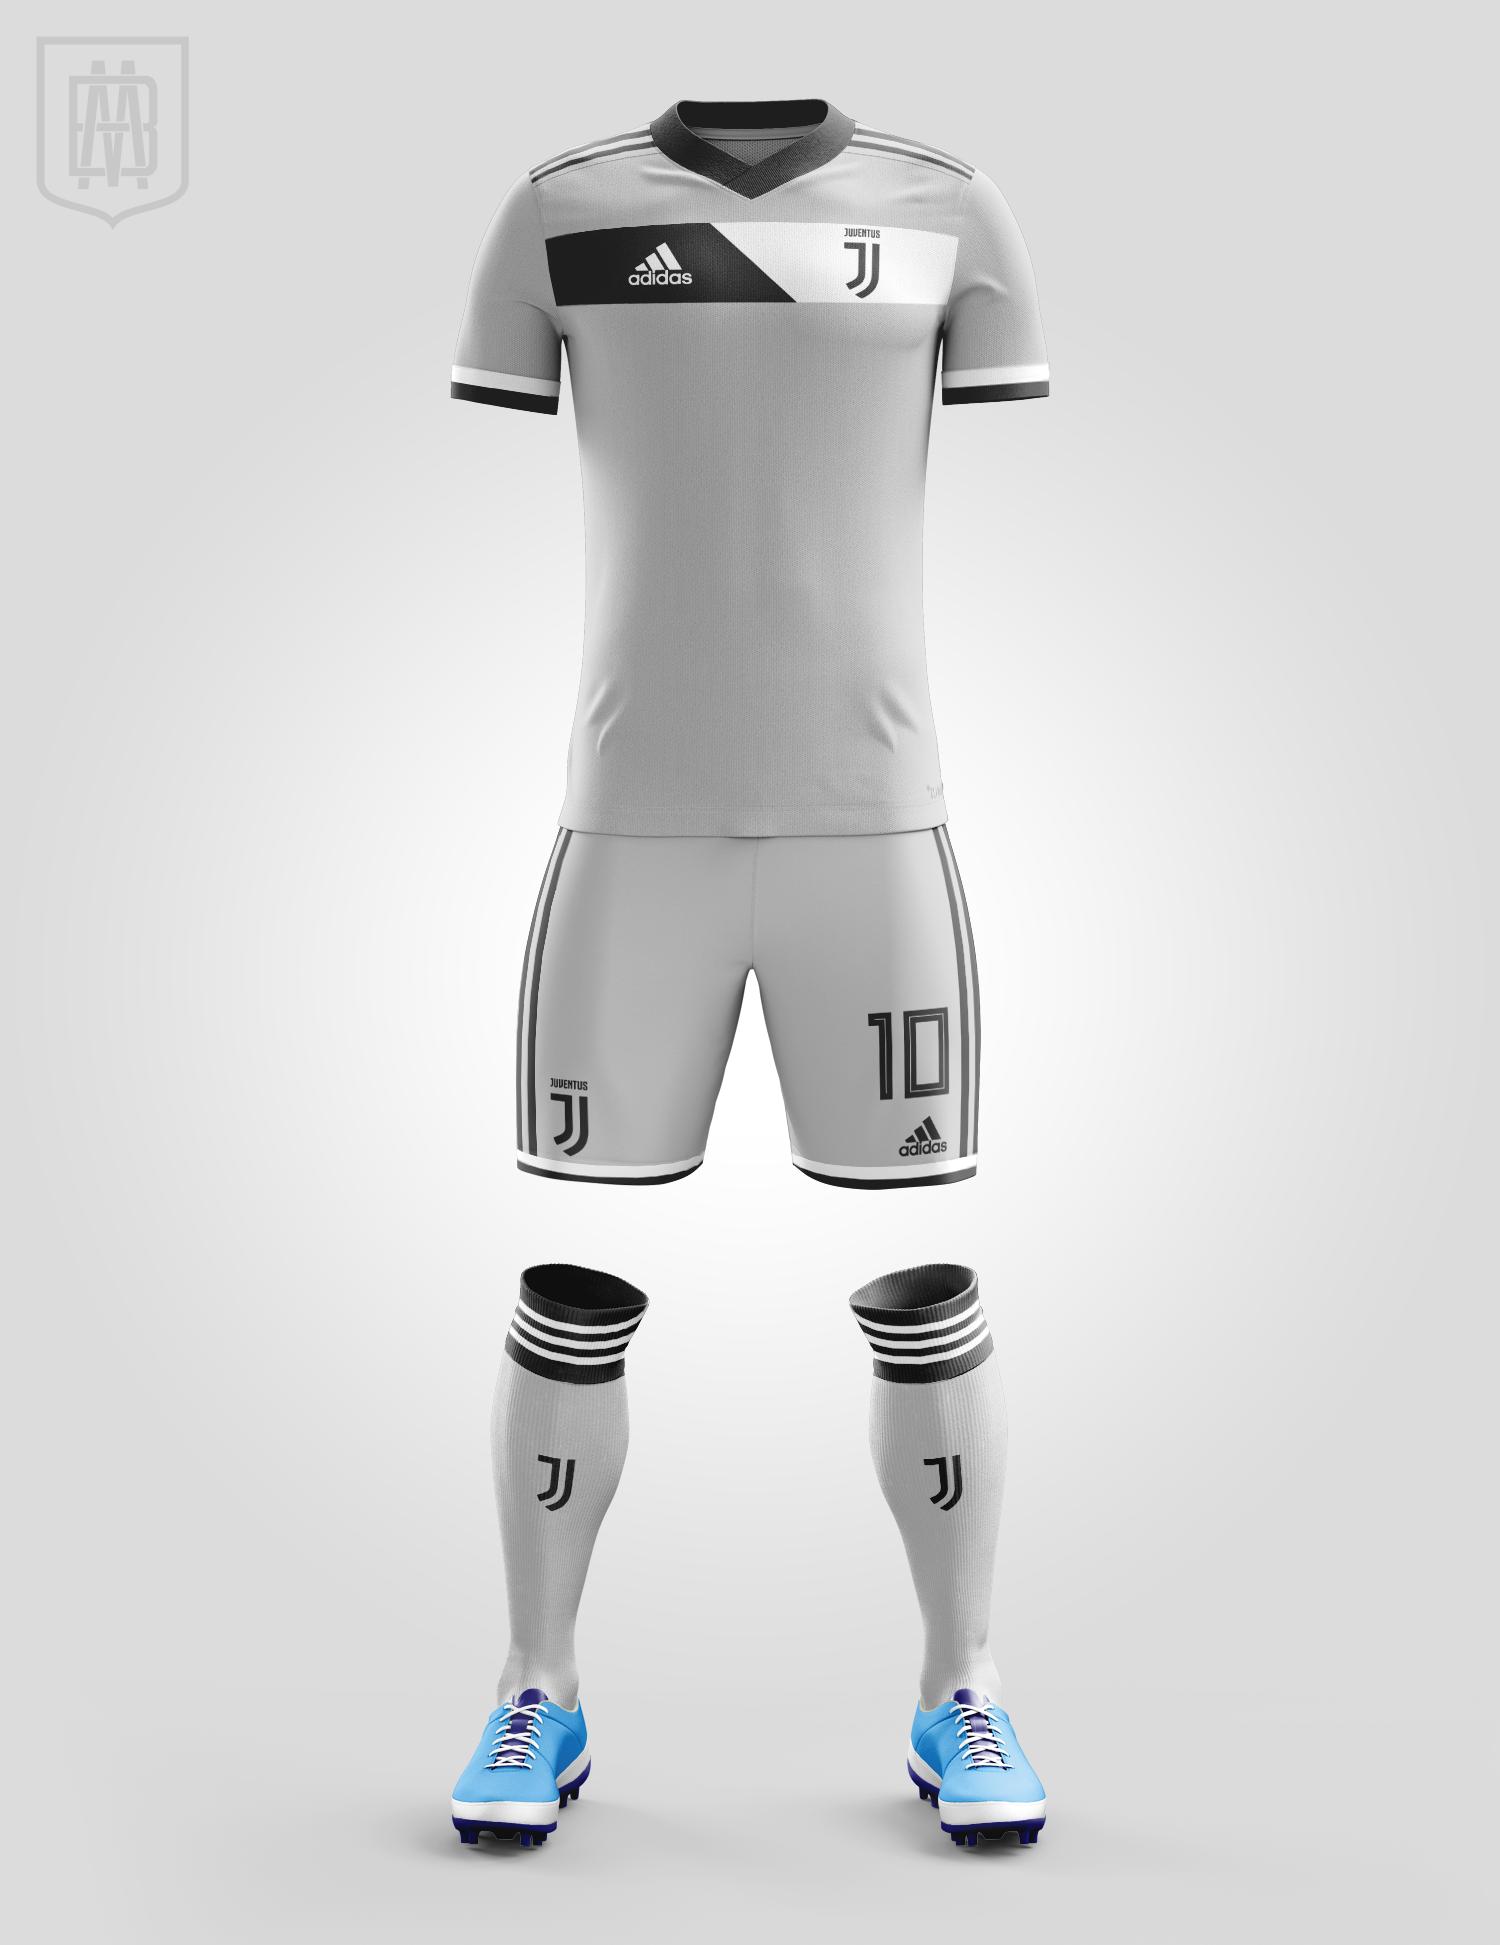 3652d3e52997a Juventus kit